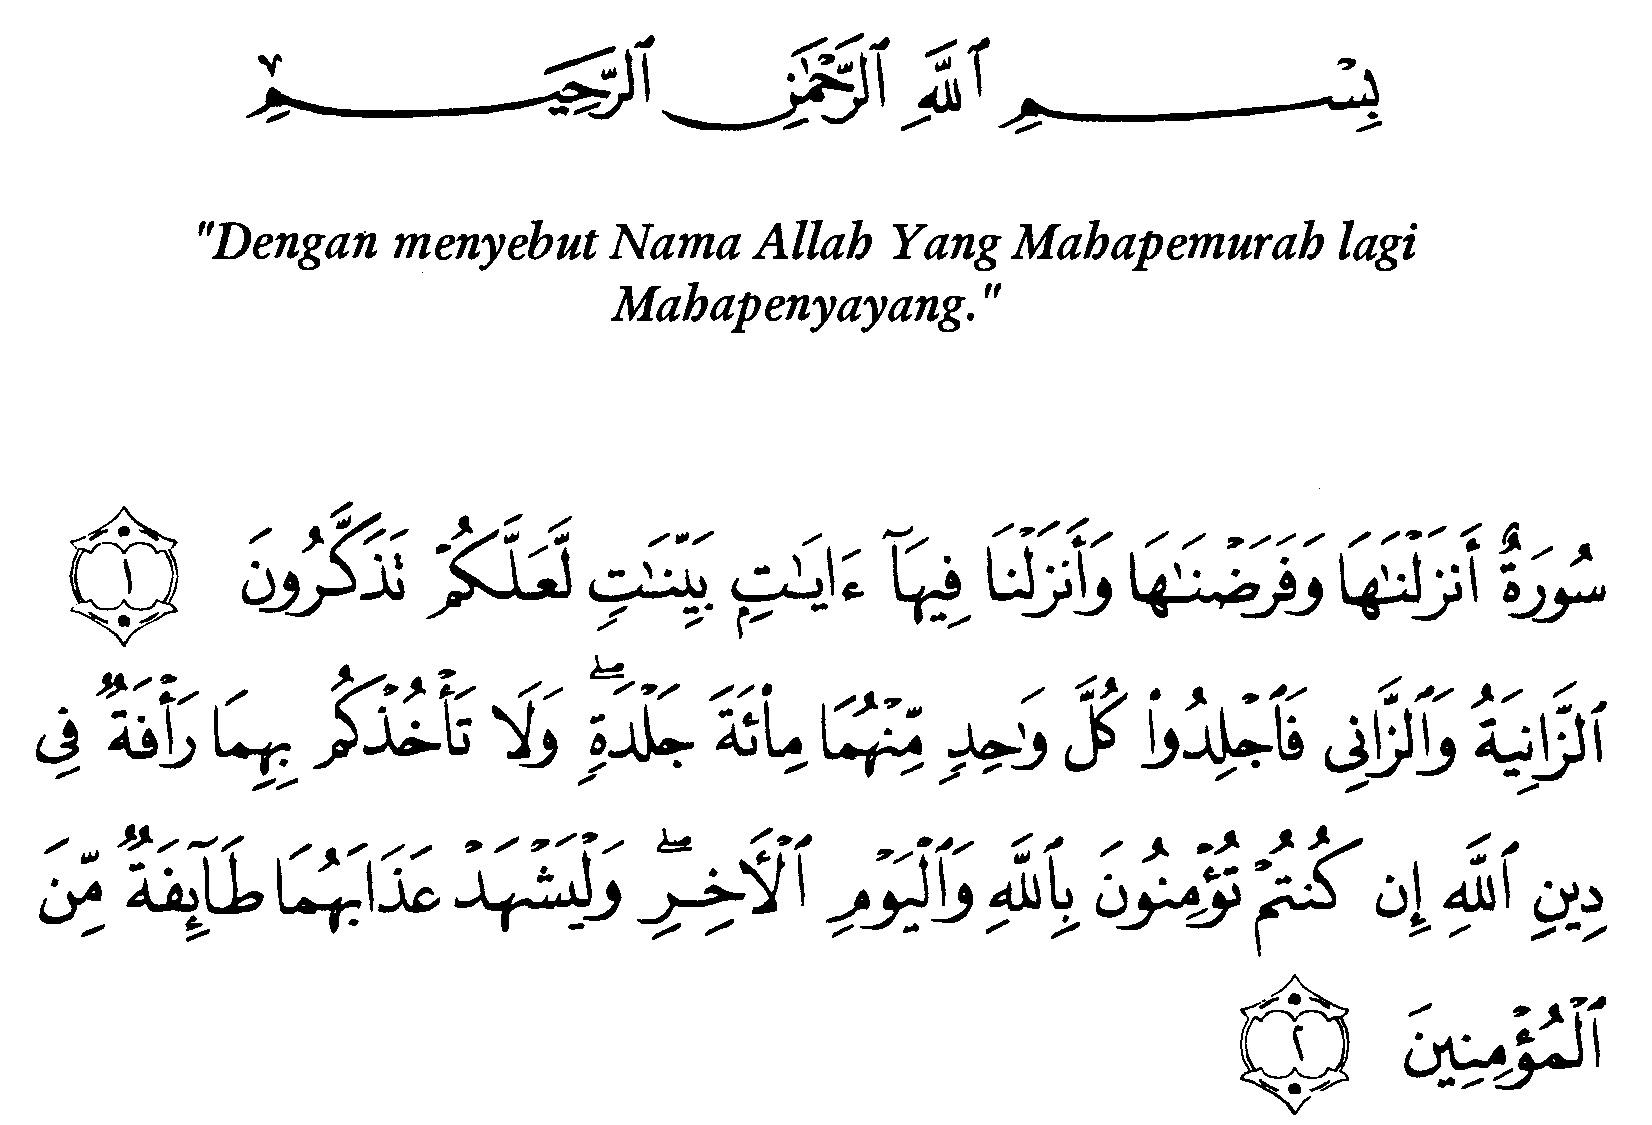 Tafsir Ibnu Katsir Surah An Nuur 1 Alquranmulia